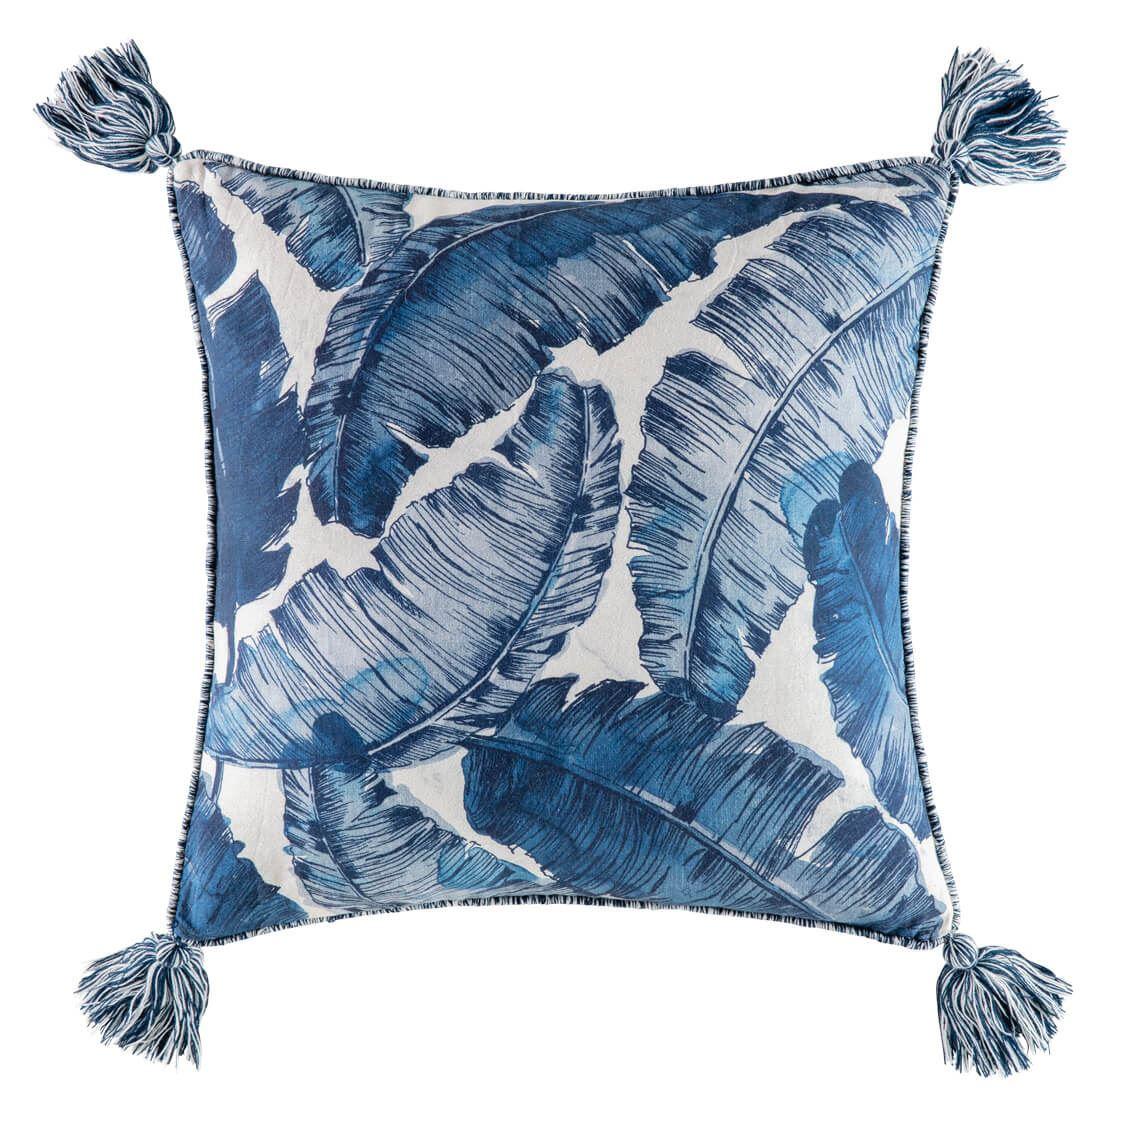 Bahna Cushion, Size W 50cm x D 15cm x H 50cm in Natural/Blue Freedom